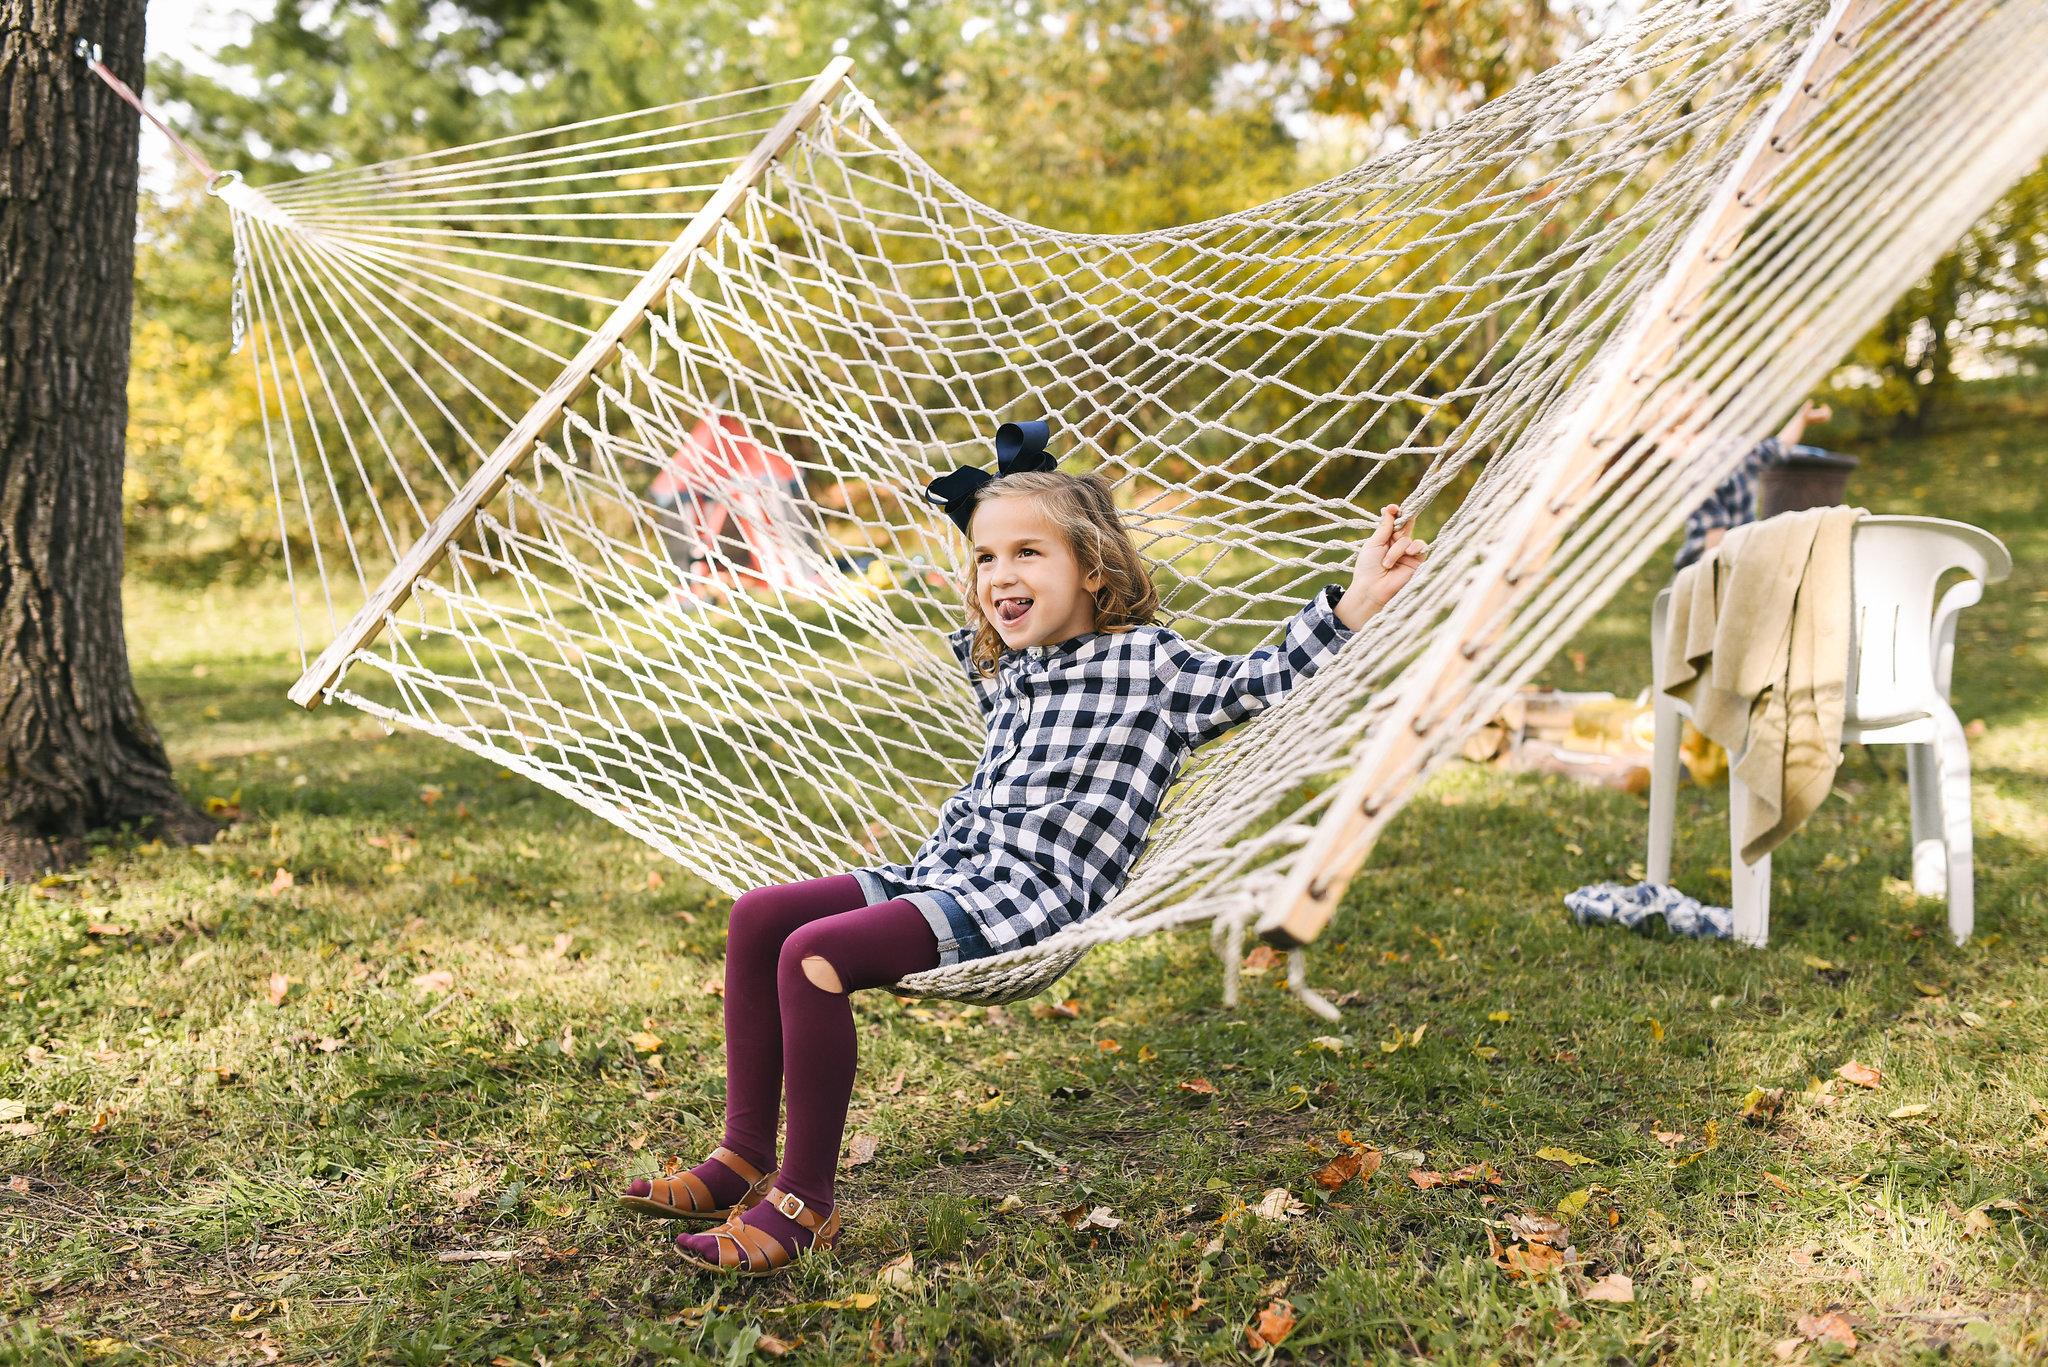 Baltimore, Maryland Wedding Photographer, Backyard Wedding, DIY, Rustic, Casual, Fall Wedding, Woodland, Little Girl on Hammock at Reception